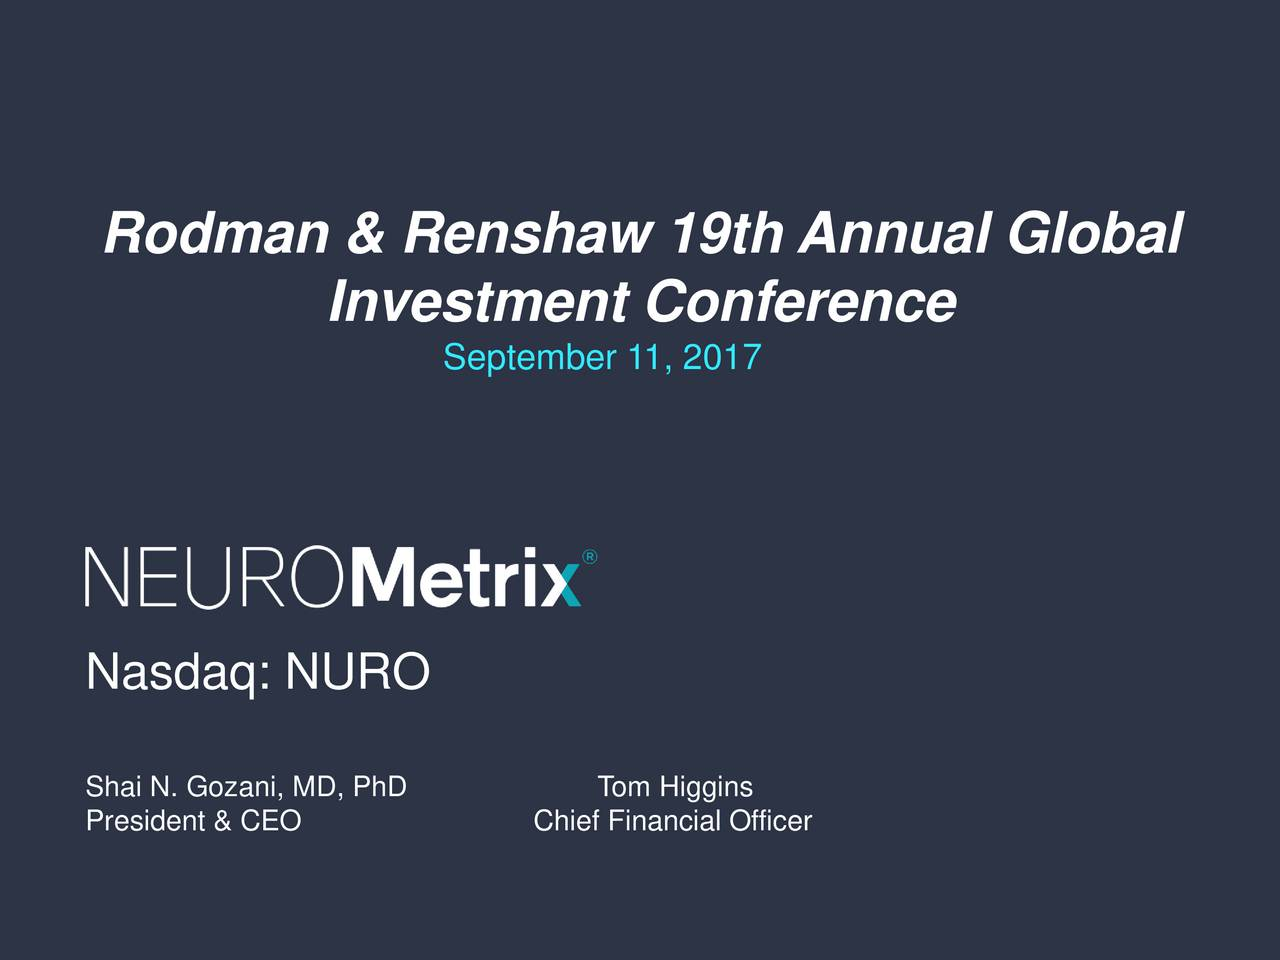 Investment Conference September 11, 2017 NEUROMetrix Nasdaq: NURO Shai N. Gozani, MD, PhD Tom Higgins President & CEO Chief Financial Officer